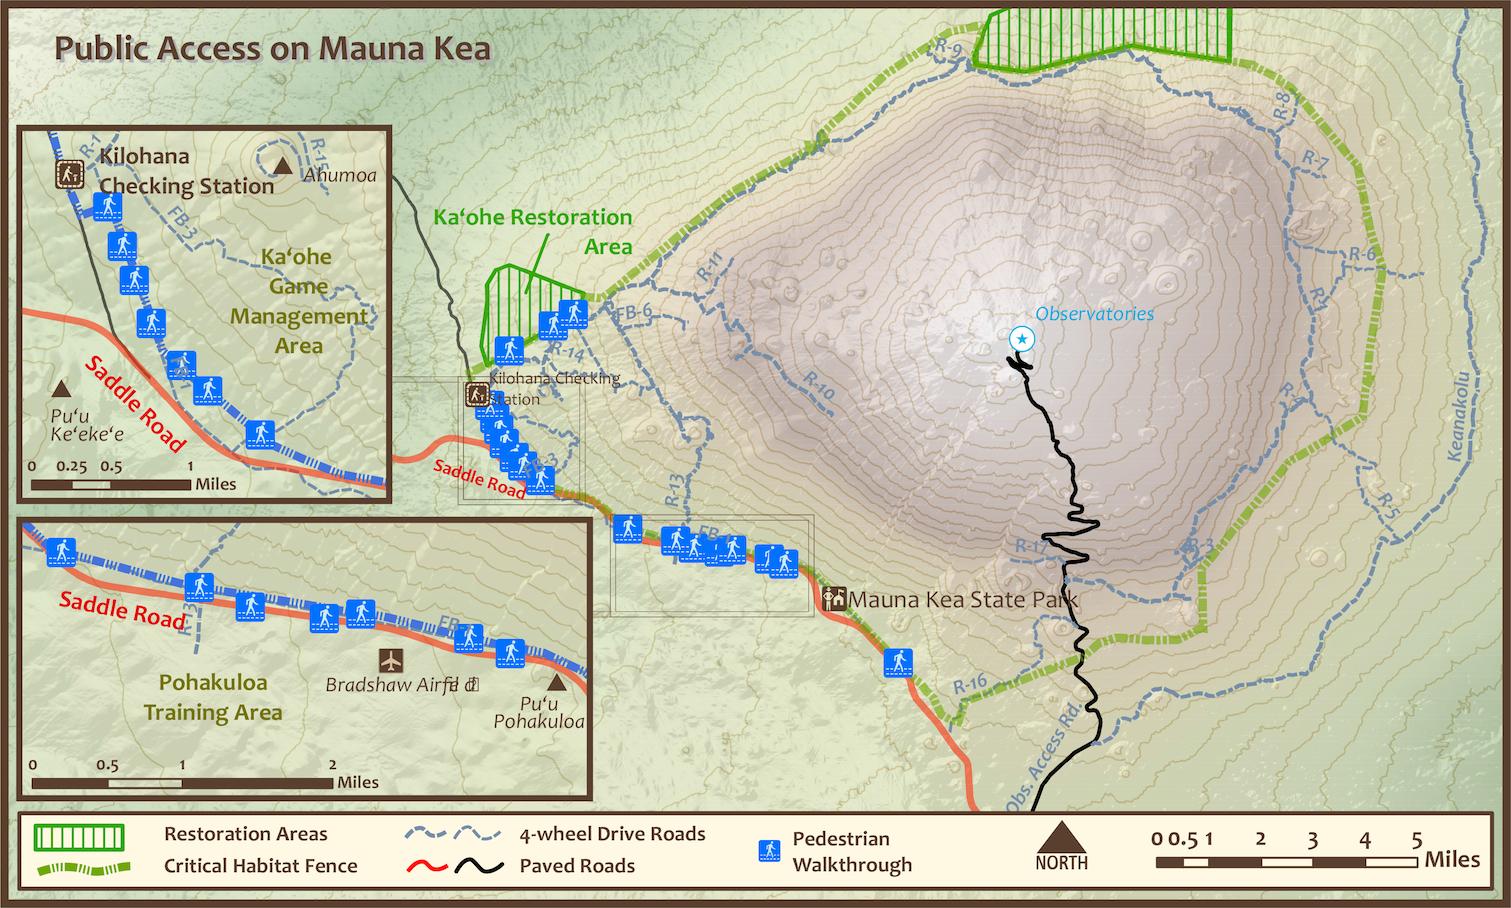 Mauna Kea Public Access Map